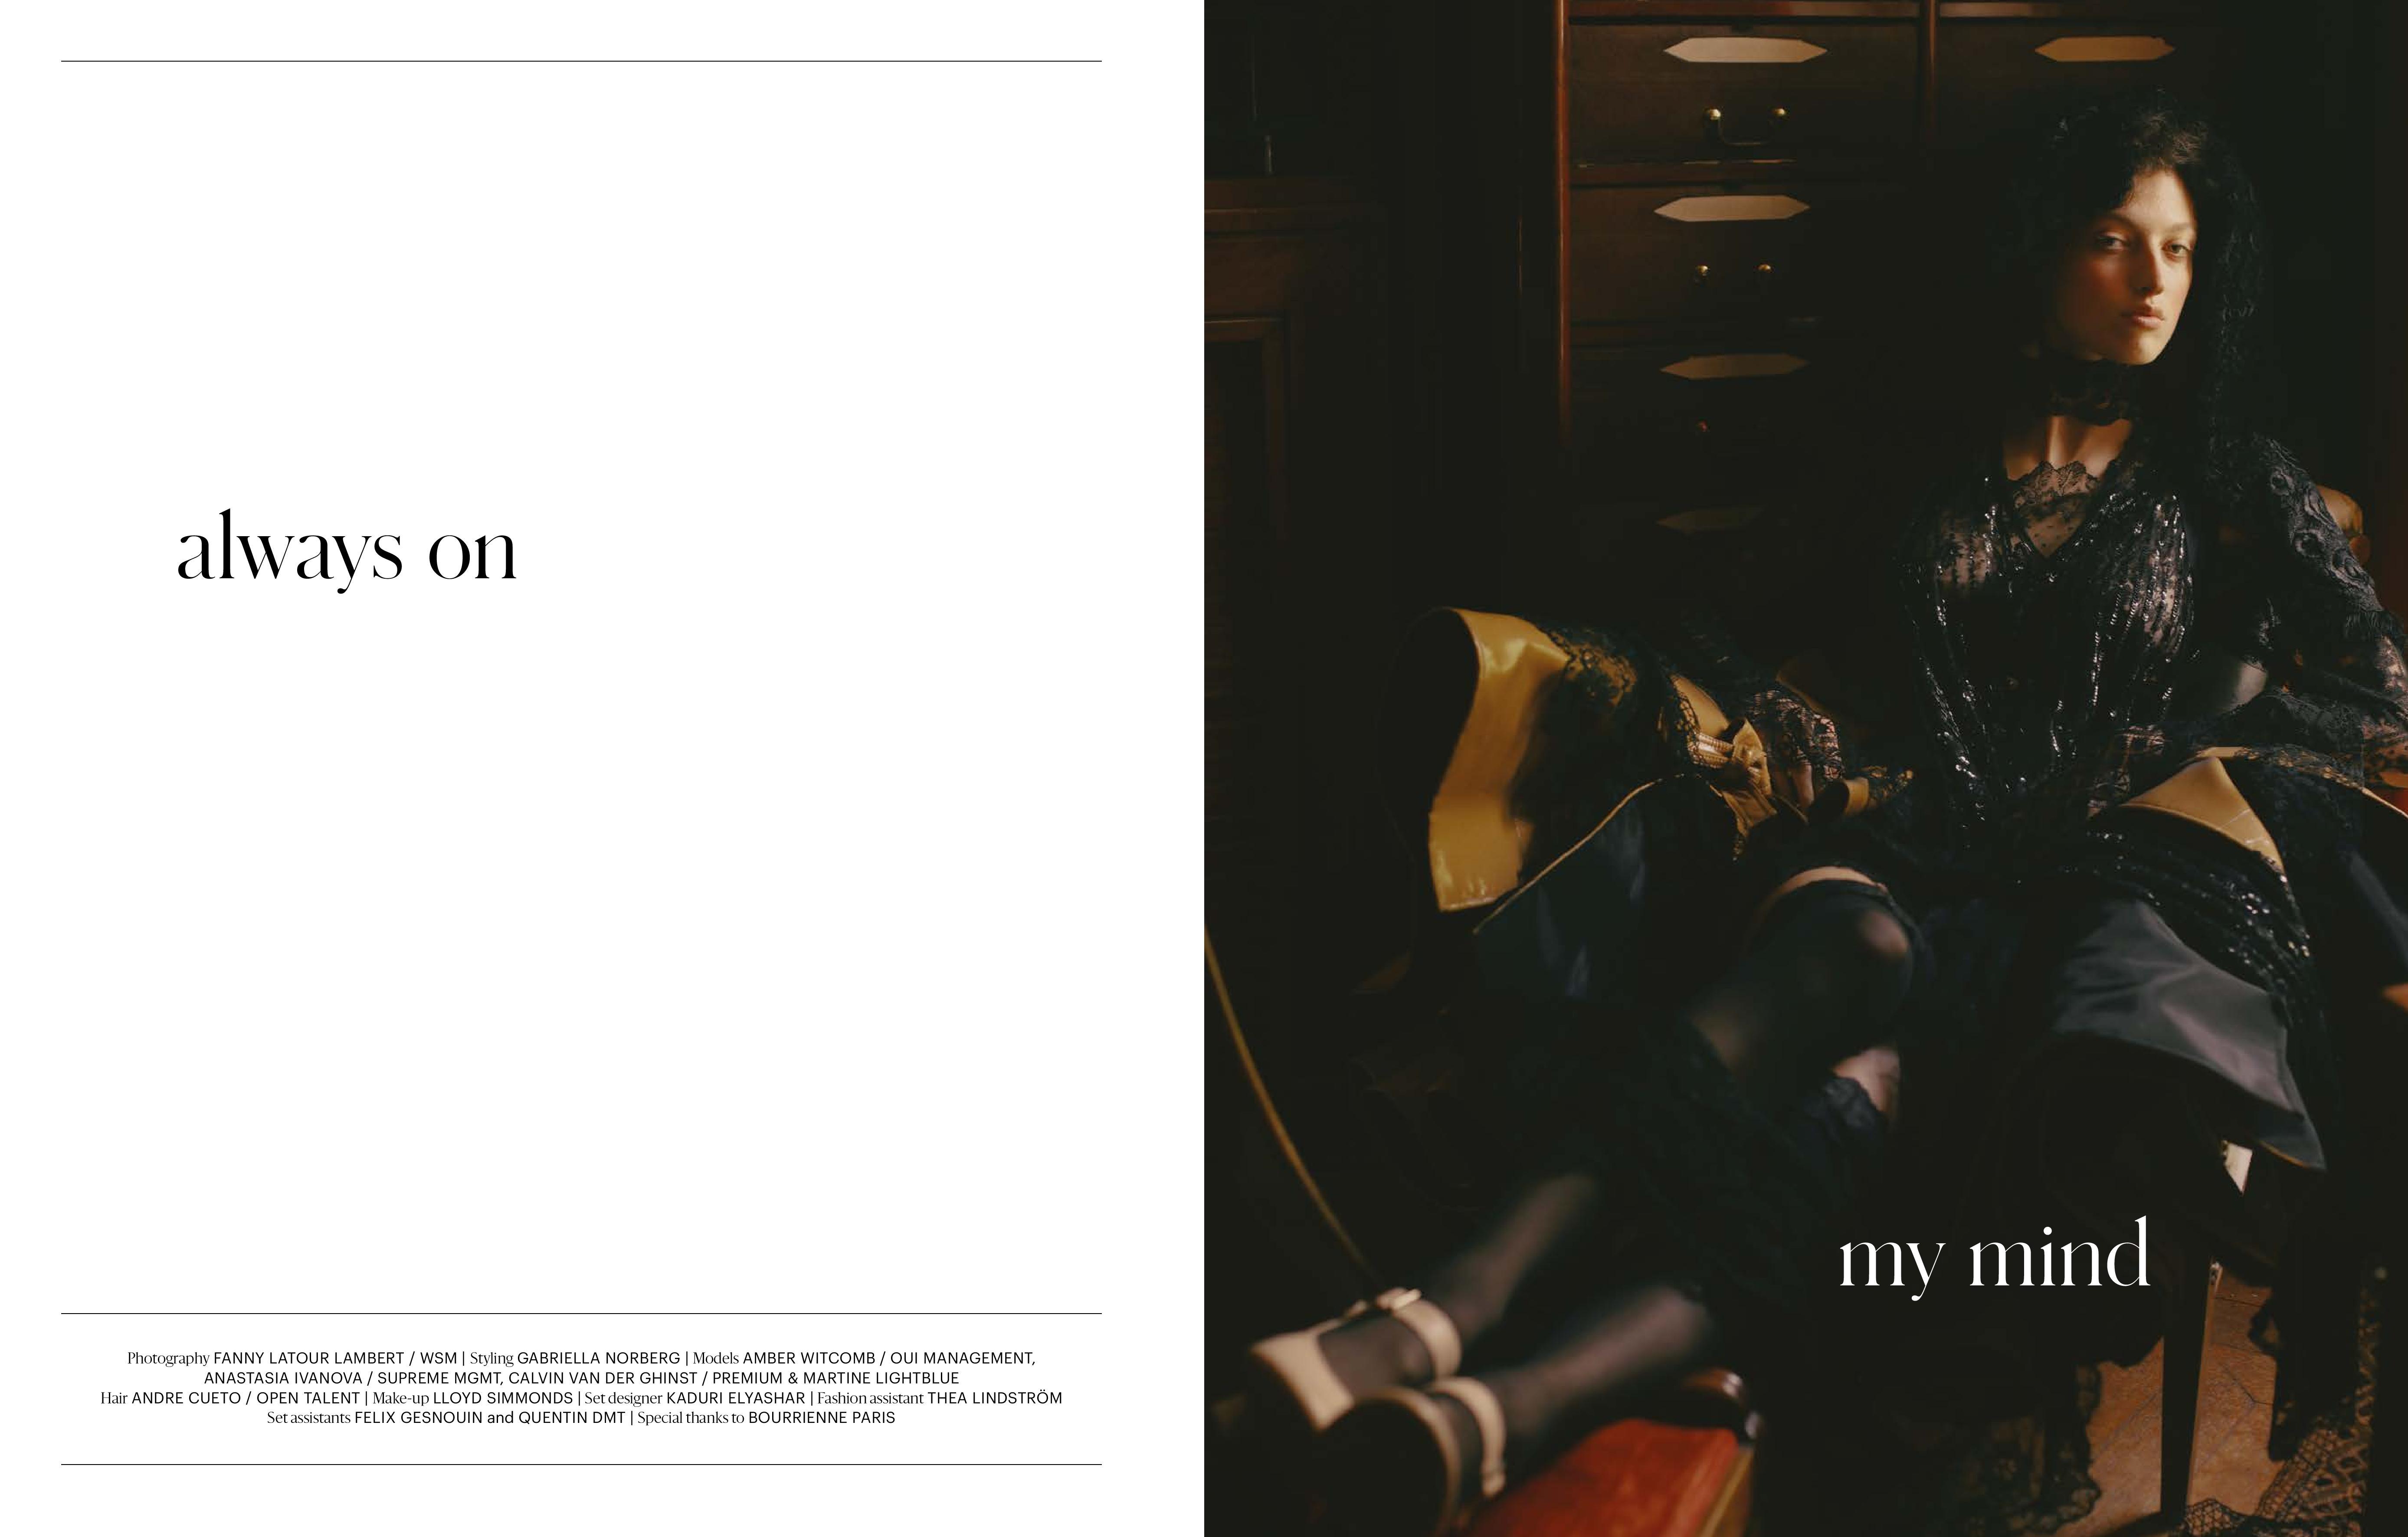 UNPOLISHED_2019_Digital_AW_Aaliyah-page-067